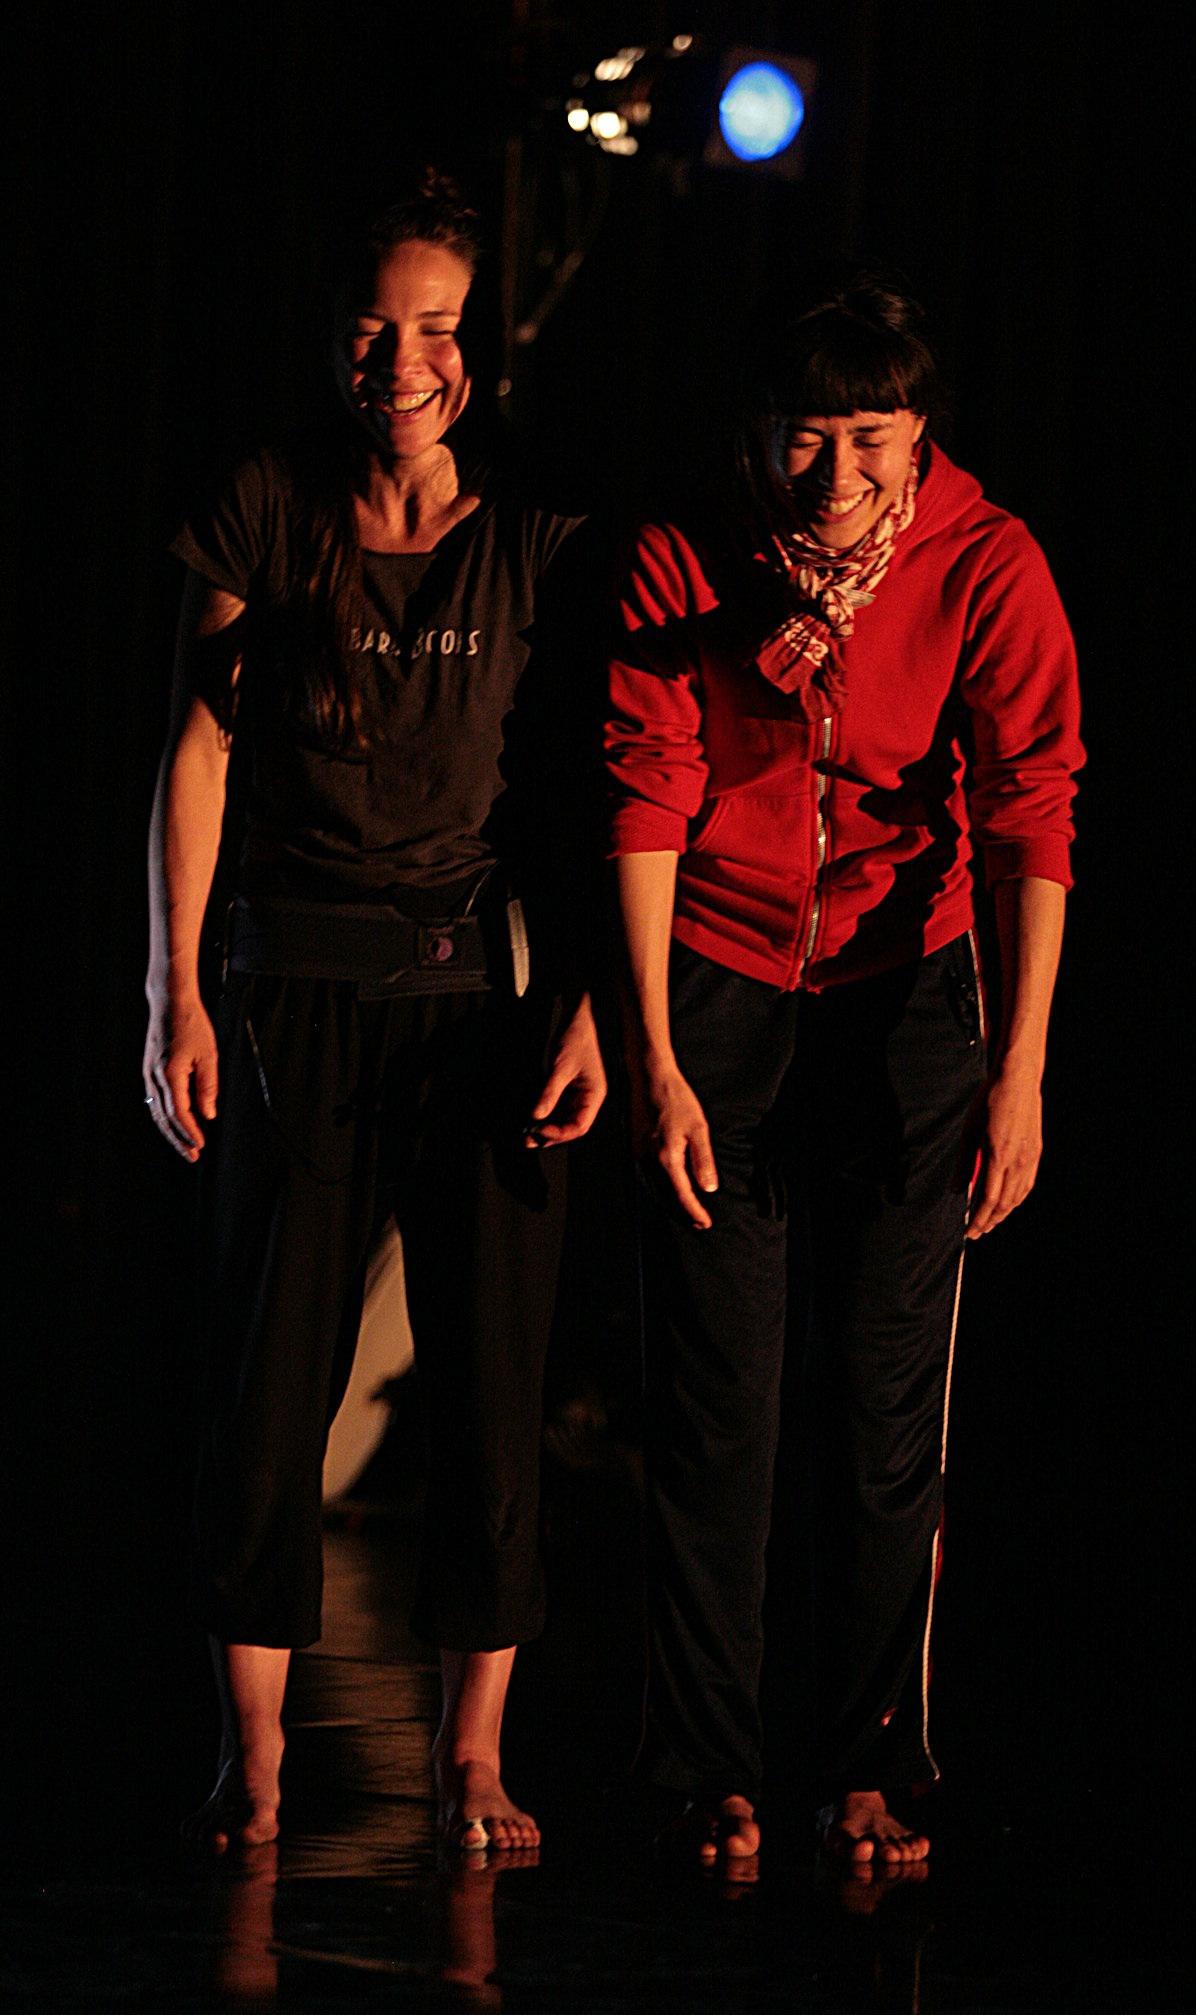 Niicugni  rehearsals. Emily and Aretha. Photos by Al Hall and Chris Cameron.